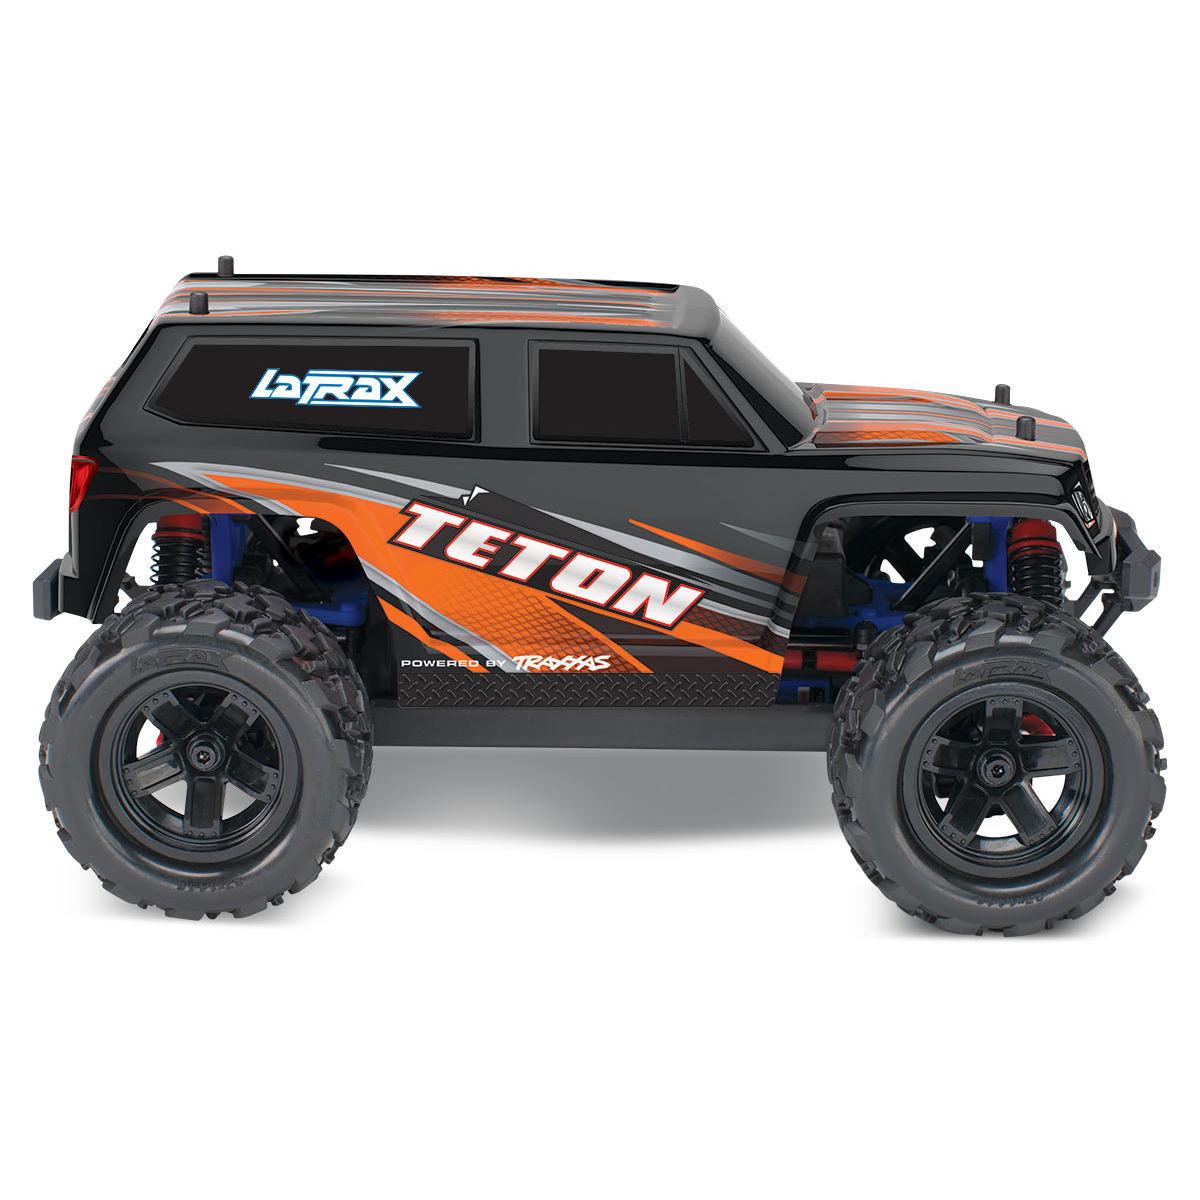 Traxxas 76054 Latrax Teton Orange Rc Monster Truck At